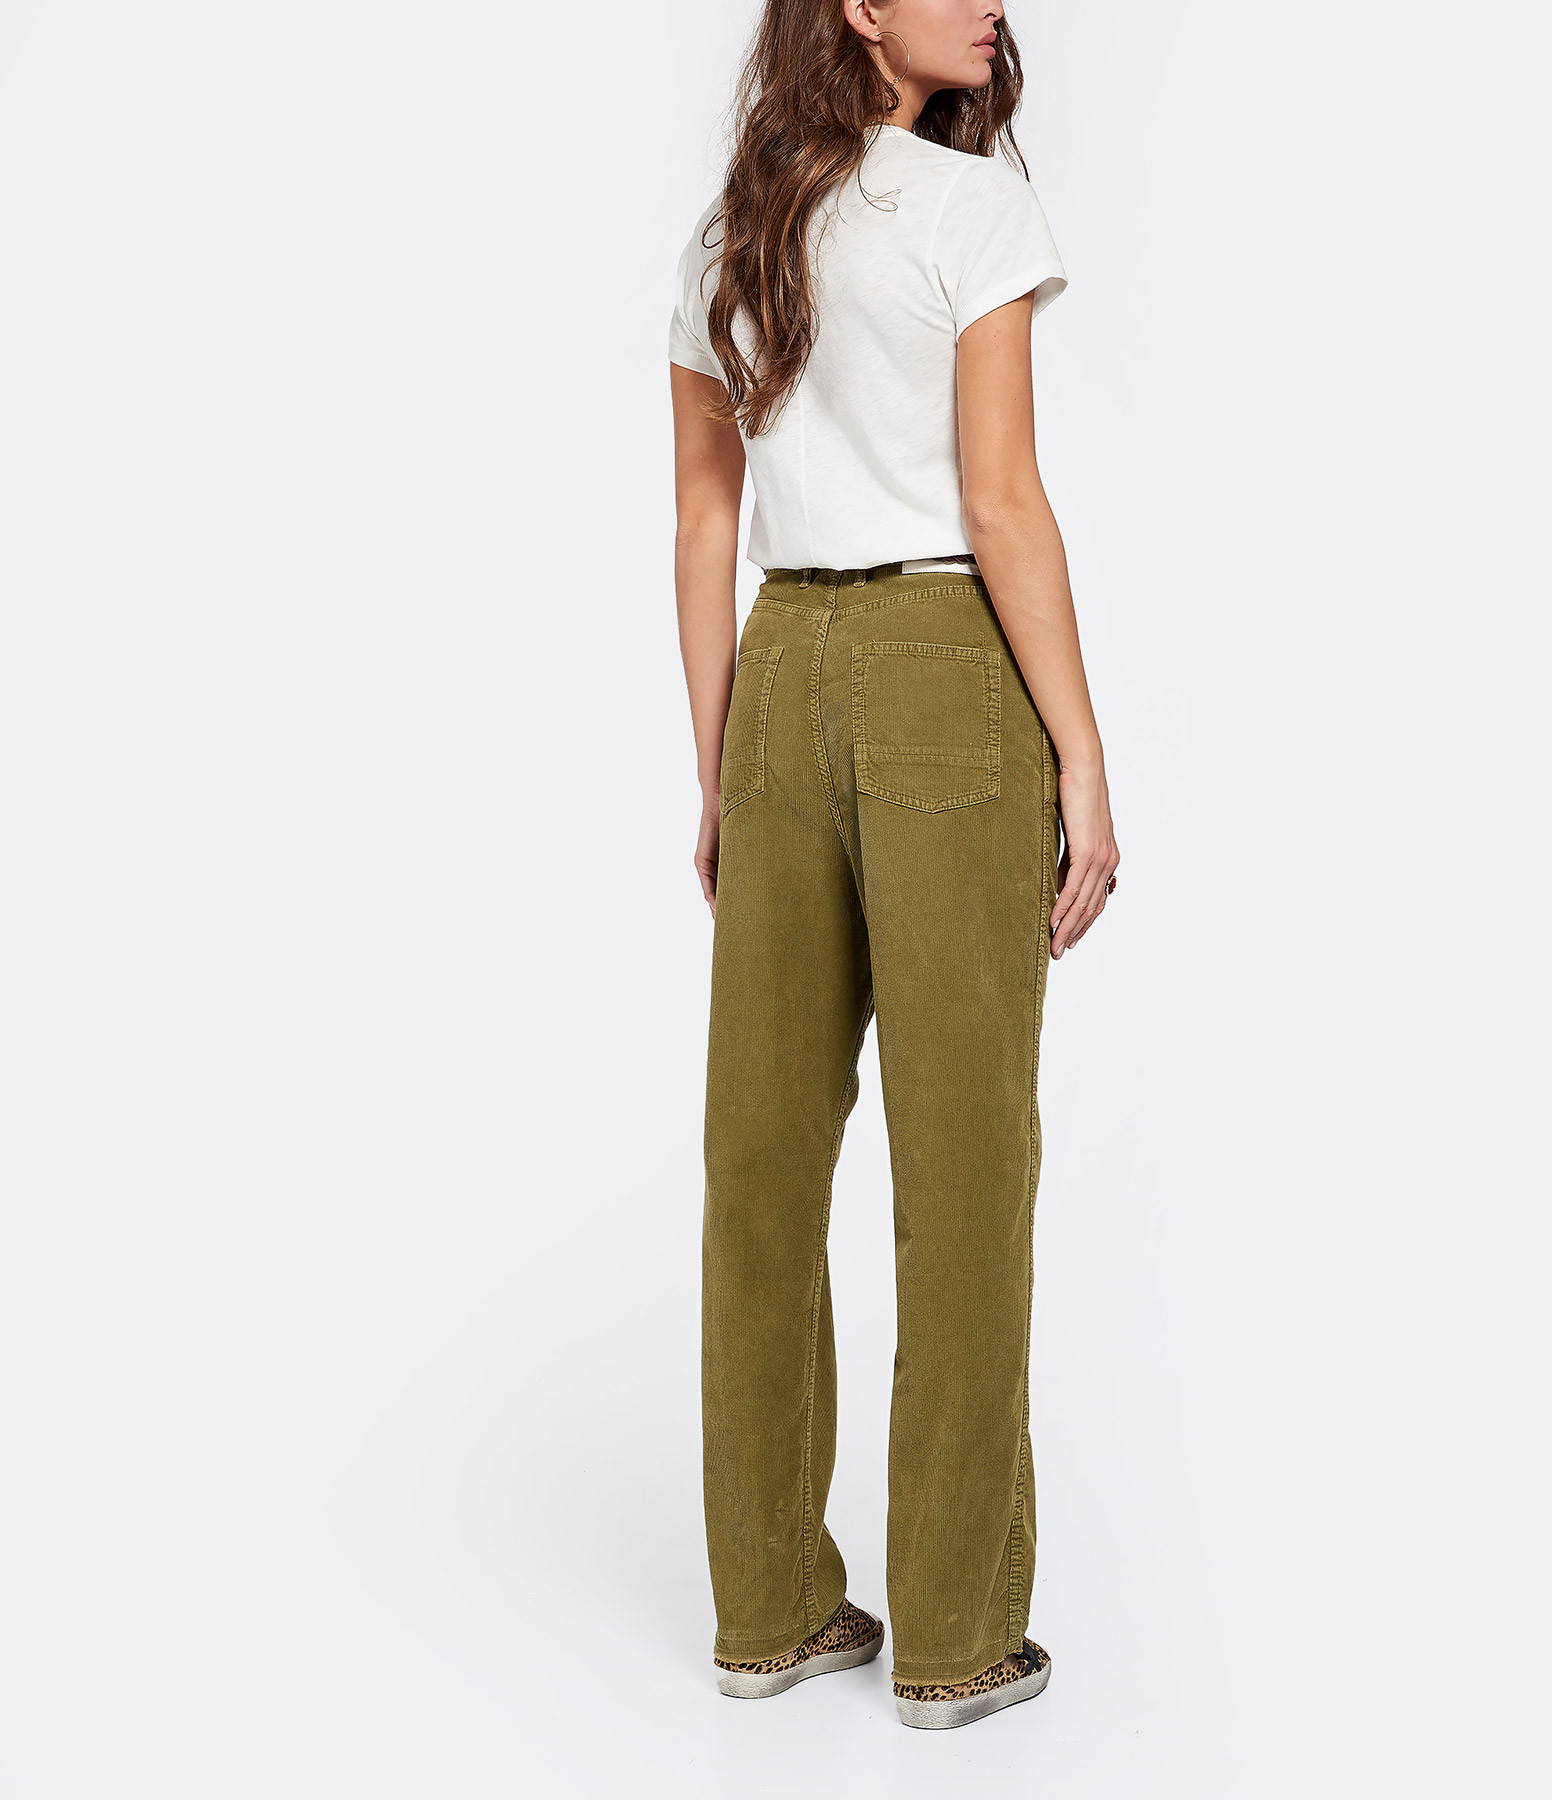 GOLDEN GOOSE - Pantalon Velours Côtelé Vert